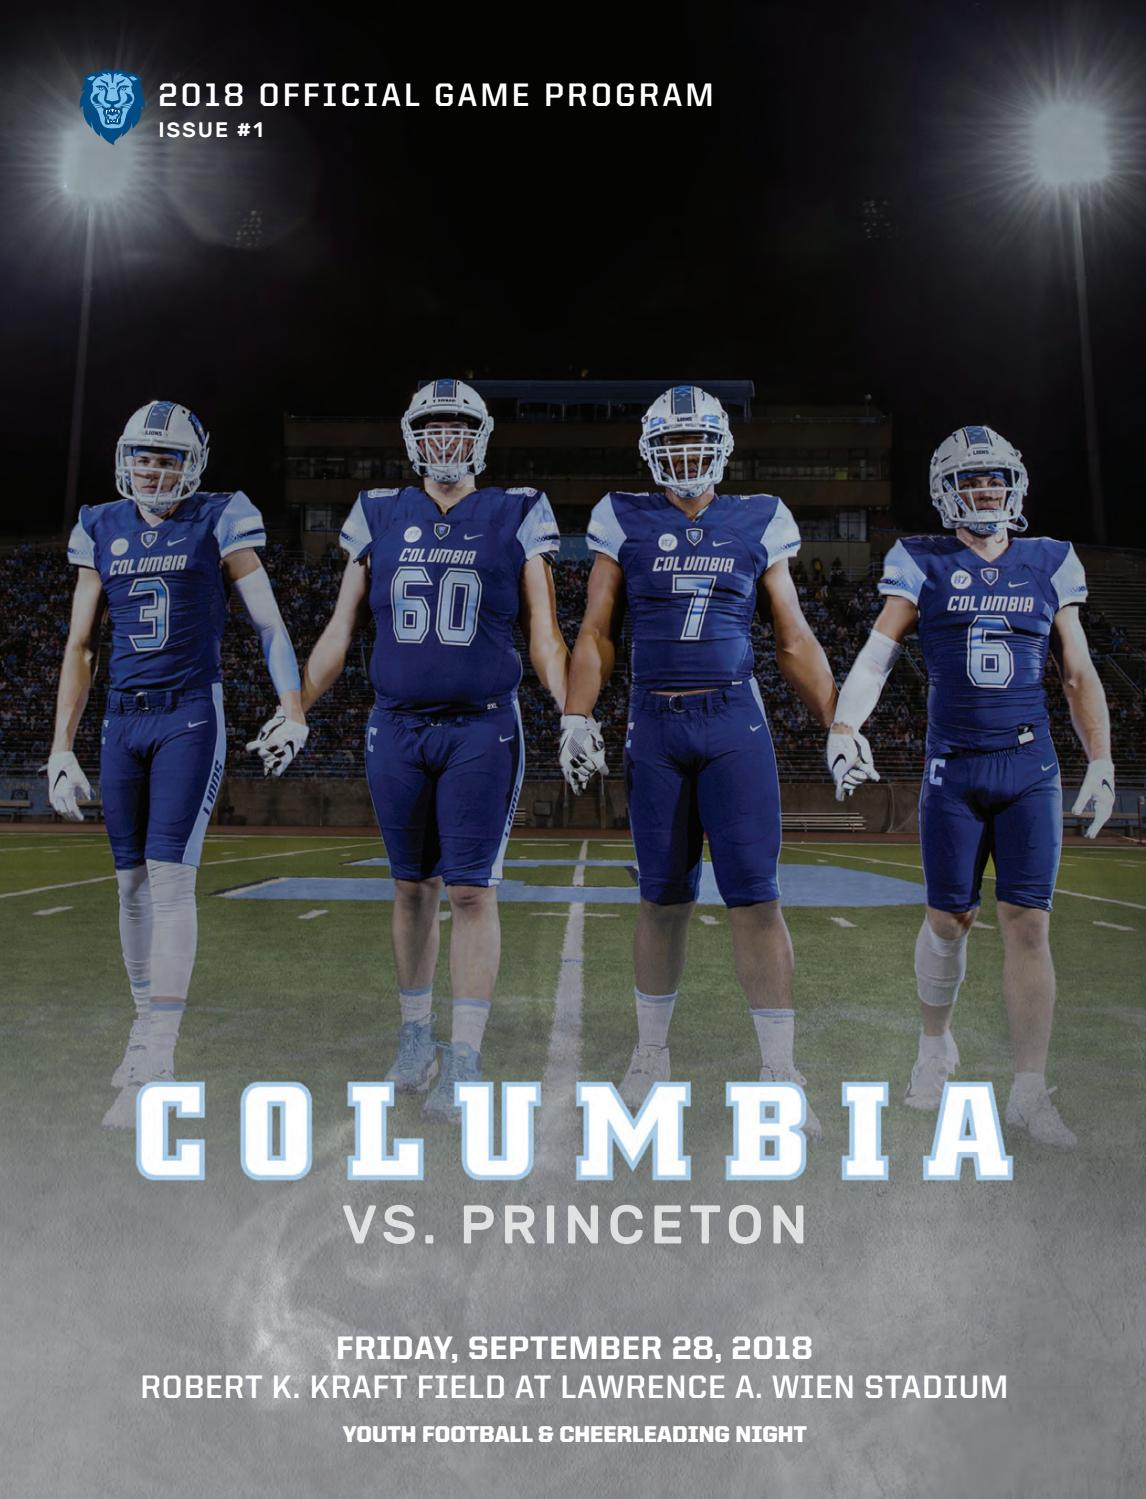 7cba5af6a Columbia Football Game Program (Sept. 28